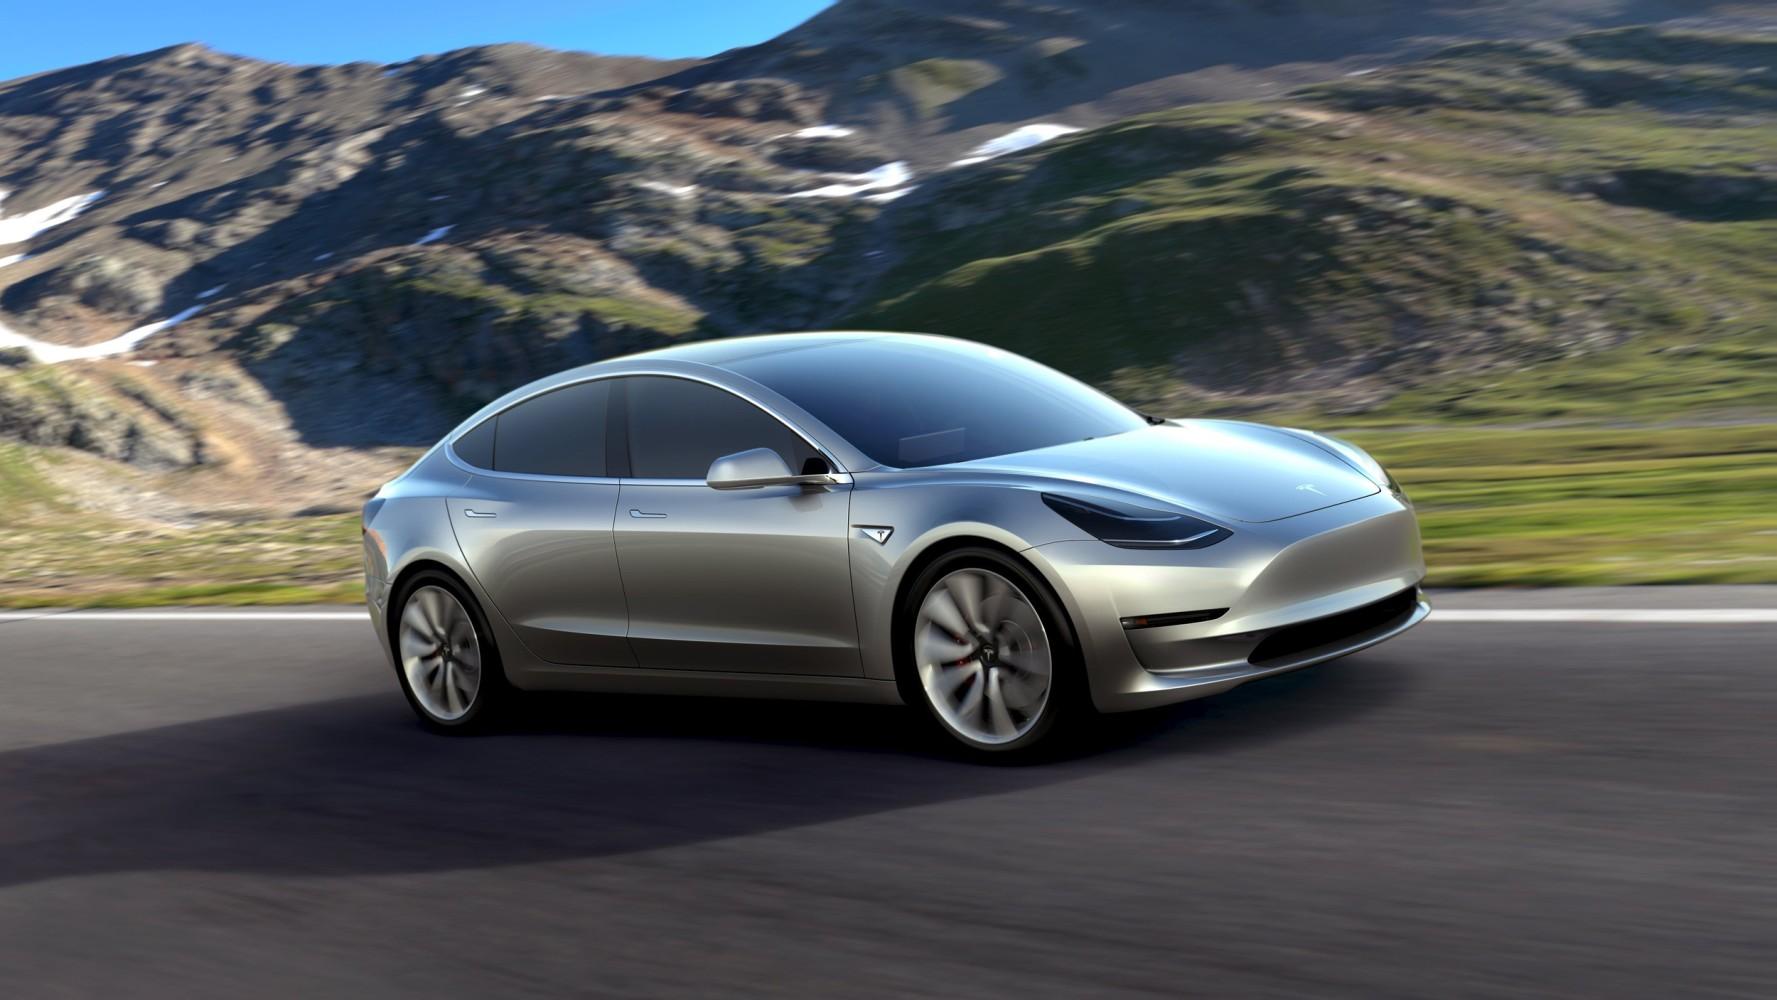 Tesla Unveils 35 000 Model 3 With Range Of 215 Miles